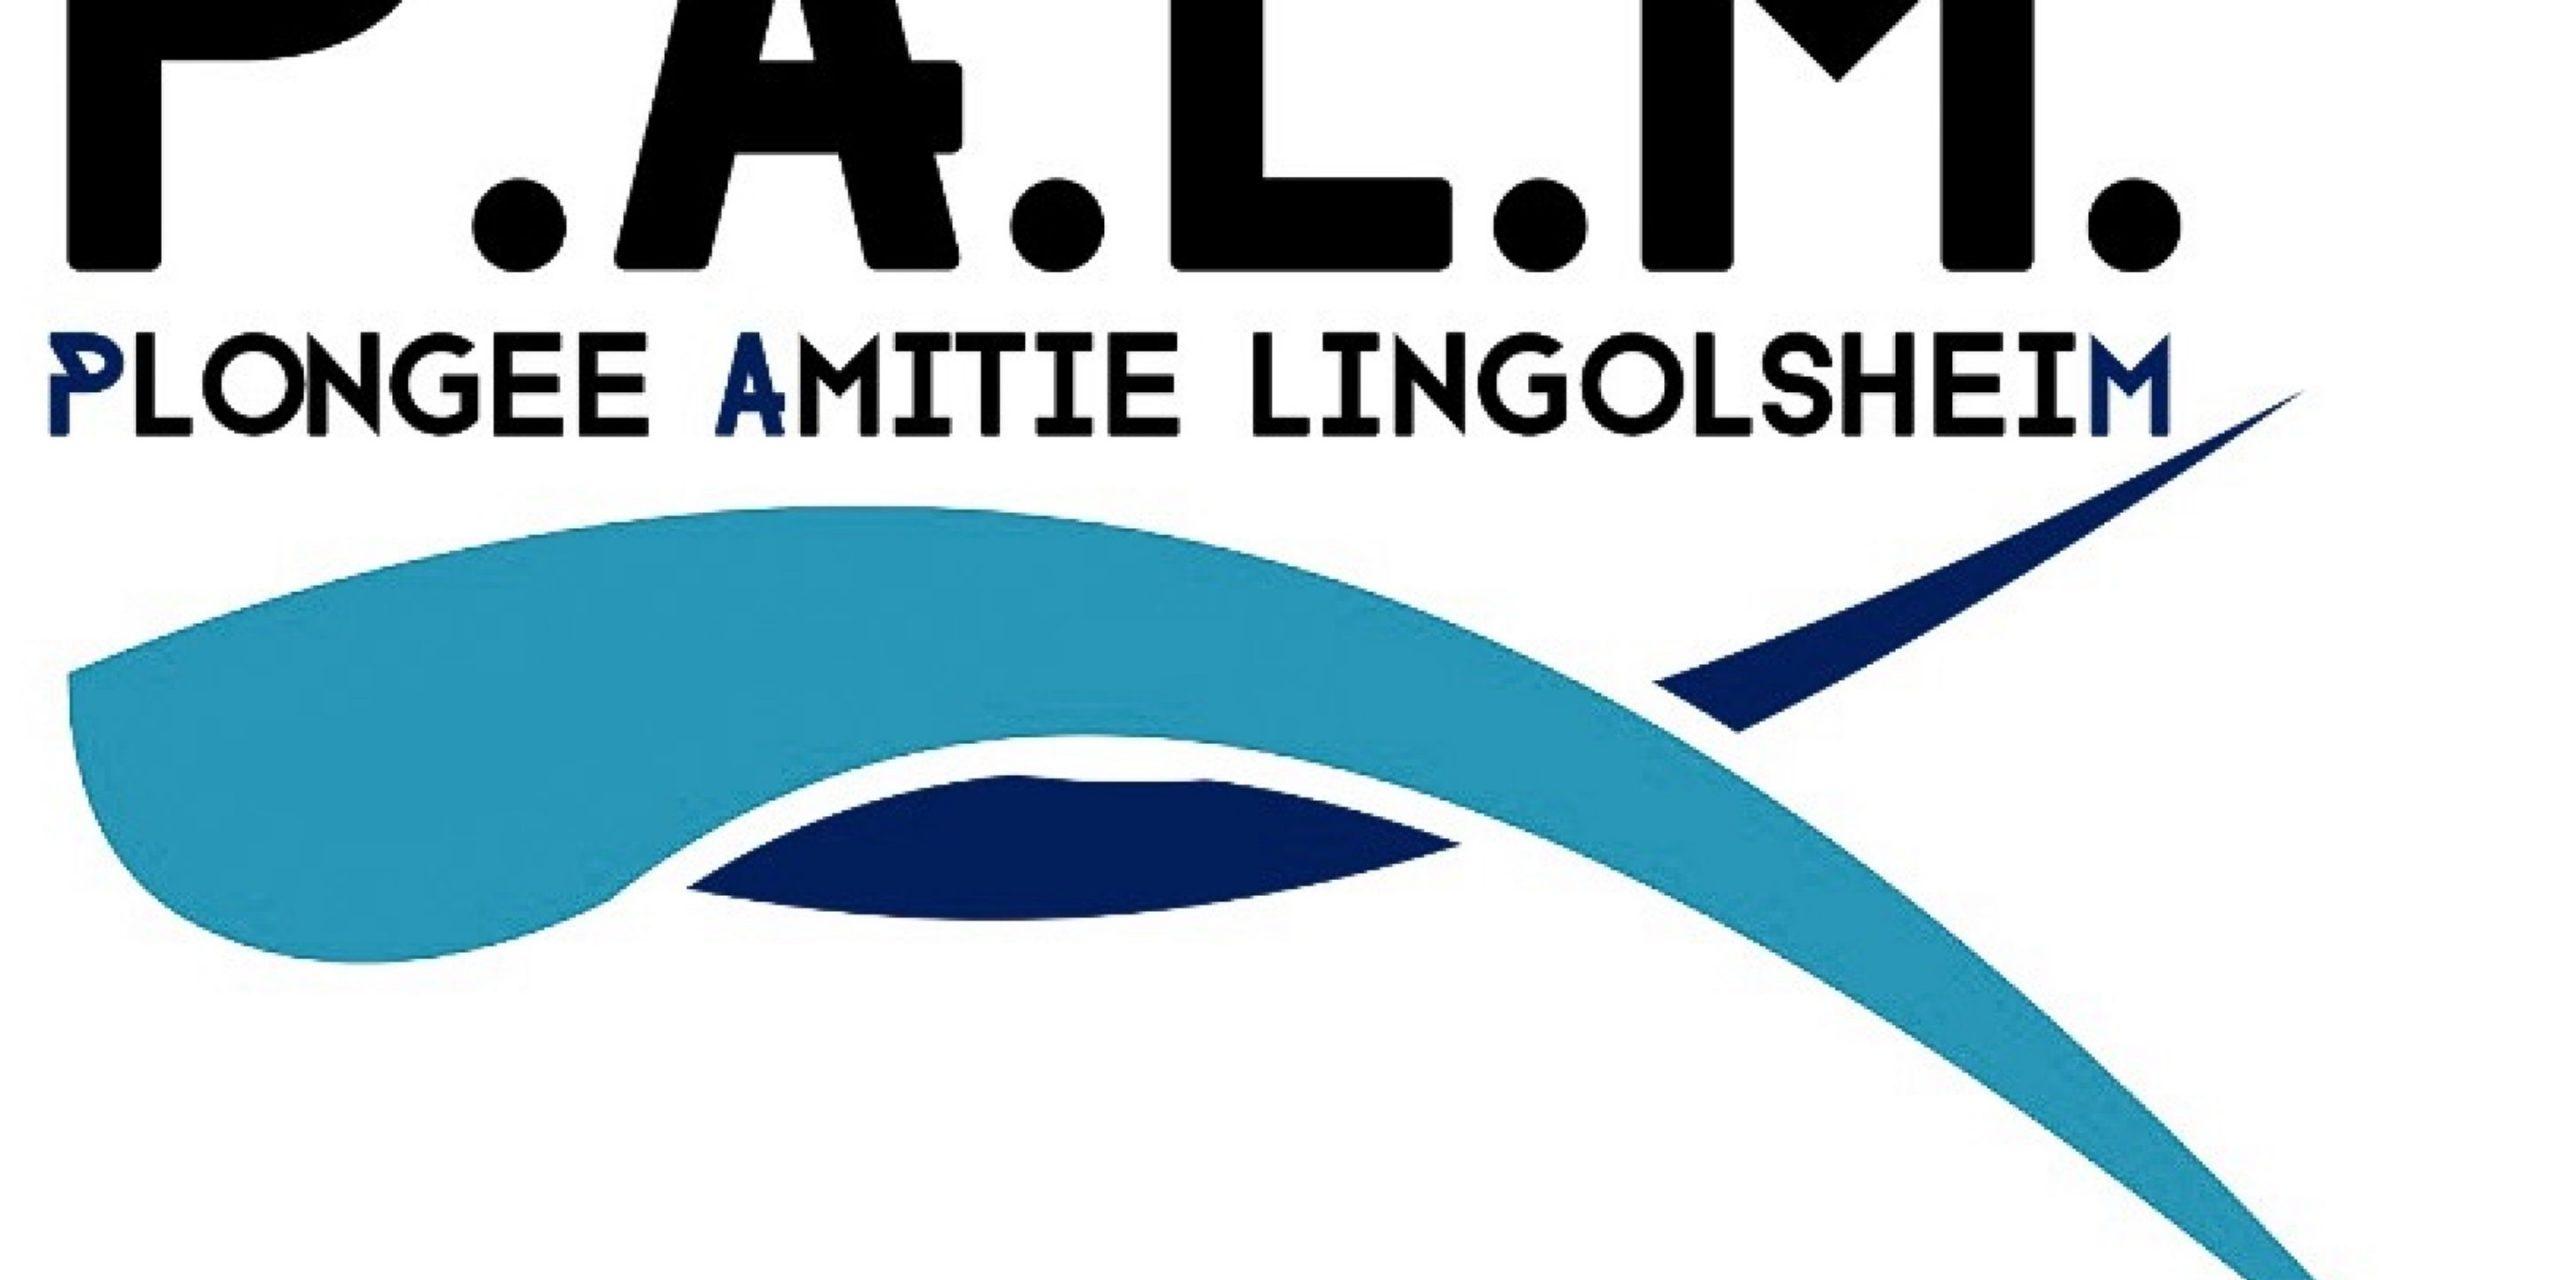 Palm Plongée Amitie Lingolsheim - Lingolsheim pour Piscine Lingolsheim Horaires